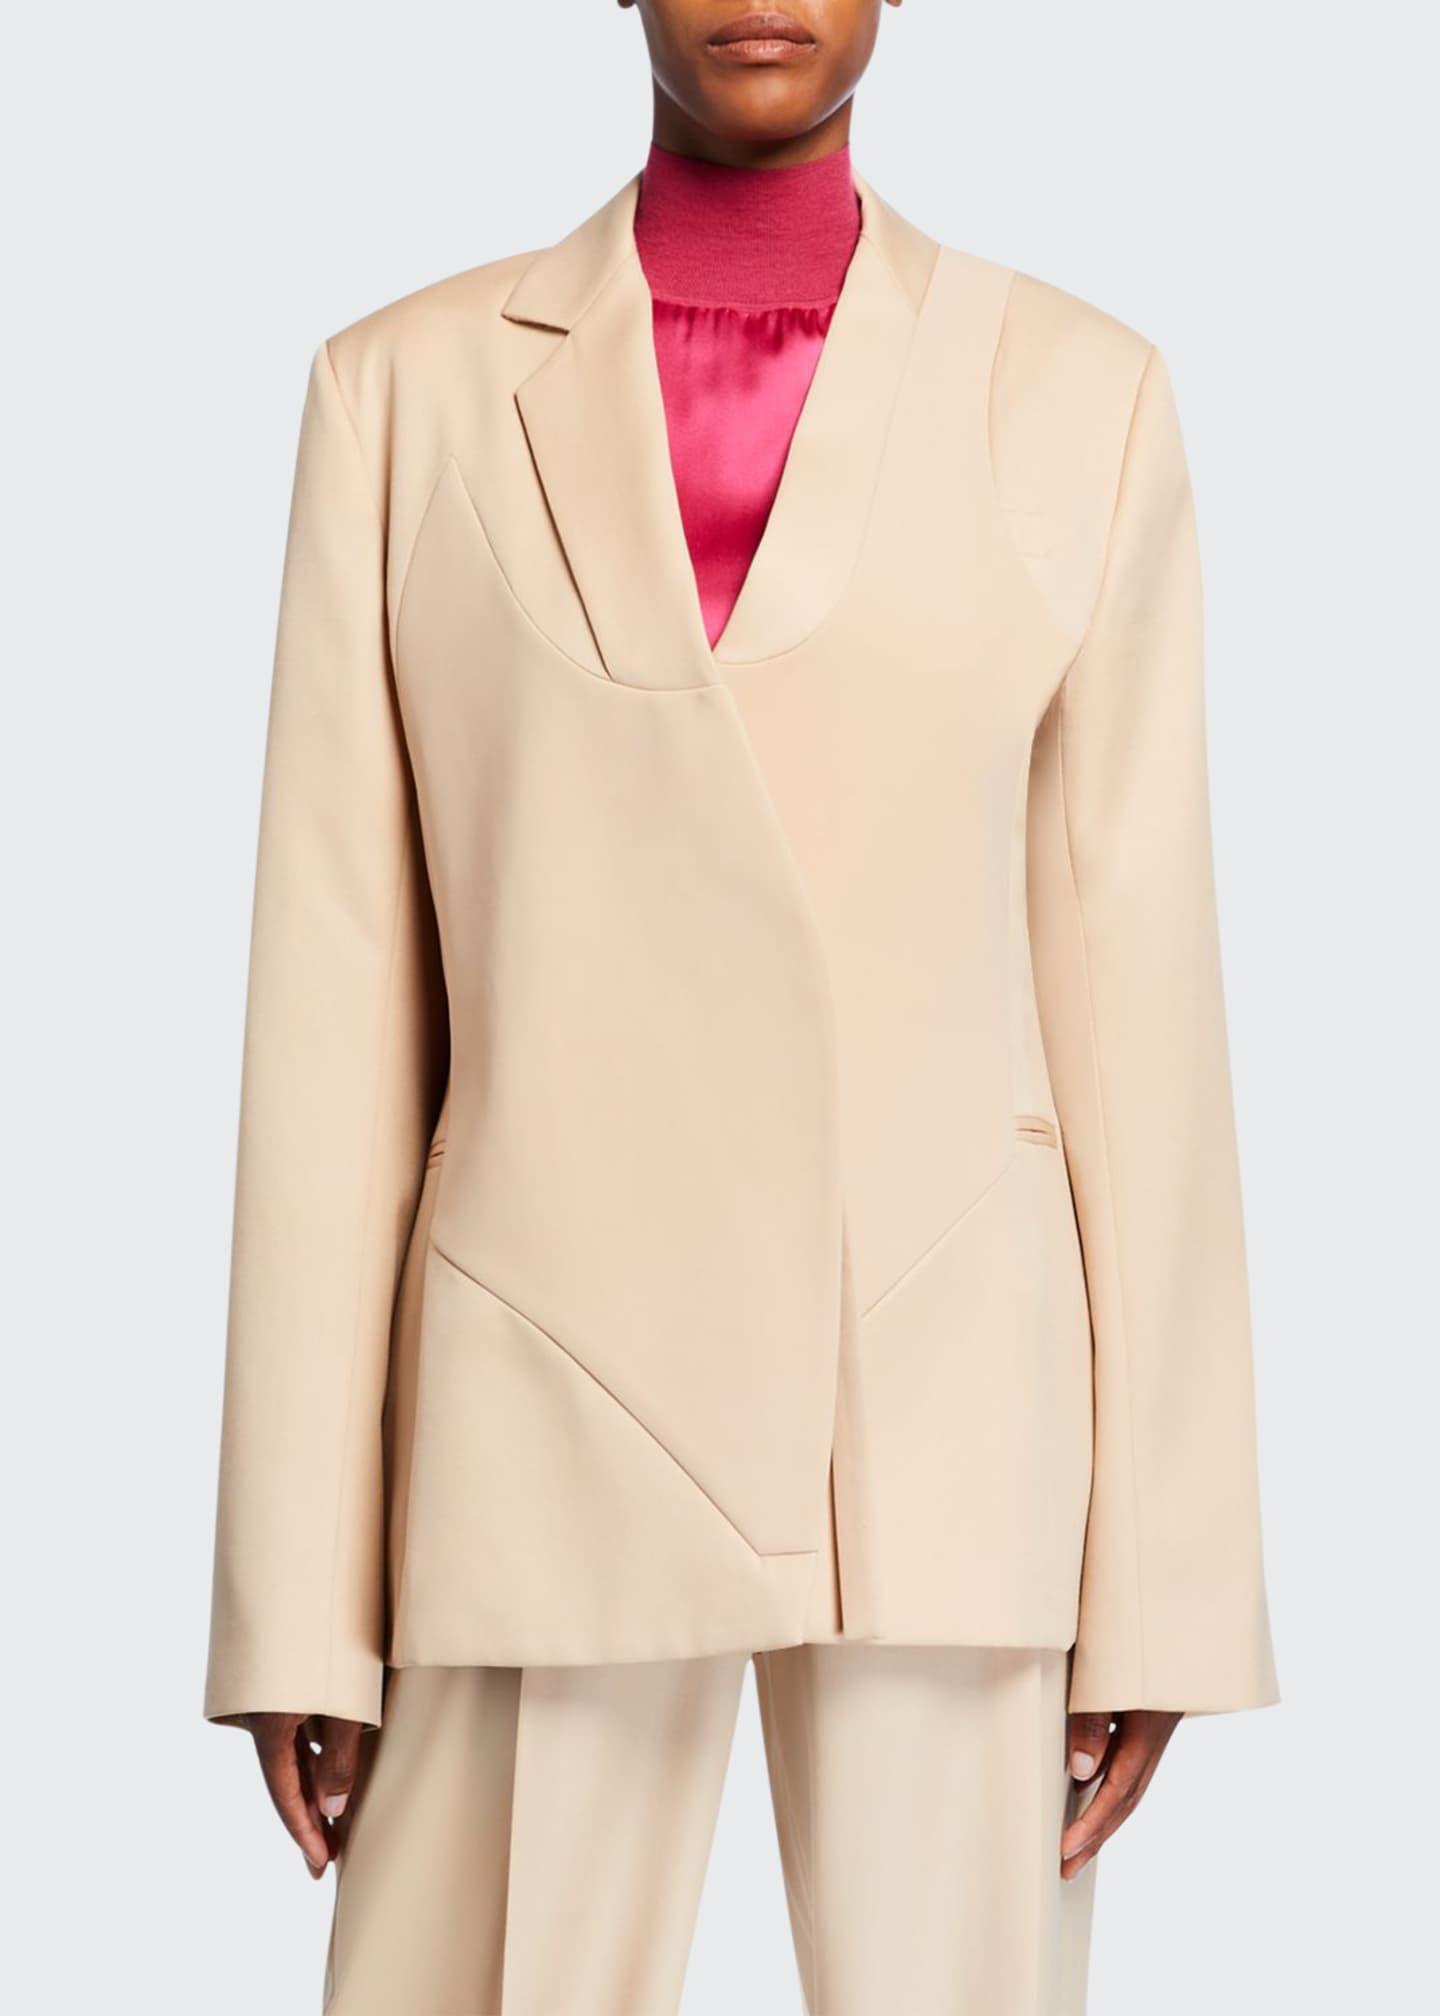 Nina Ricci Seamed-Front Wool Blazer